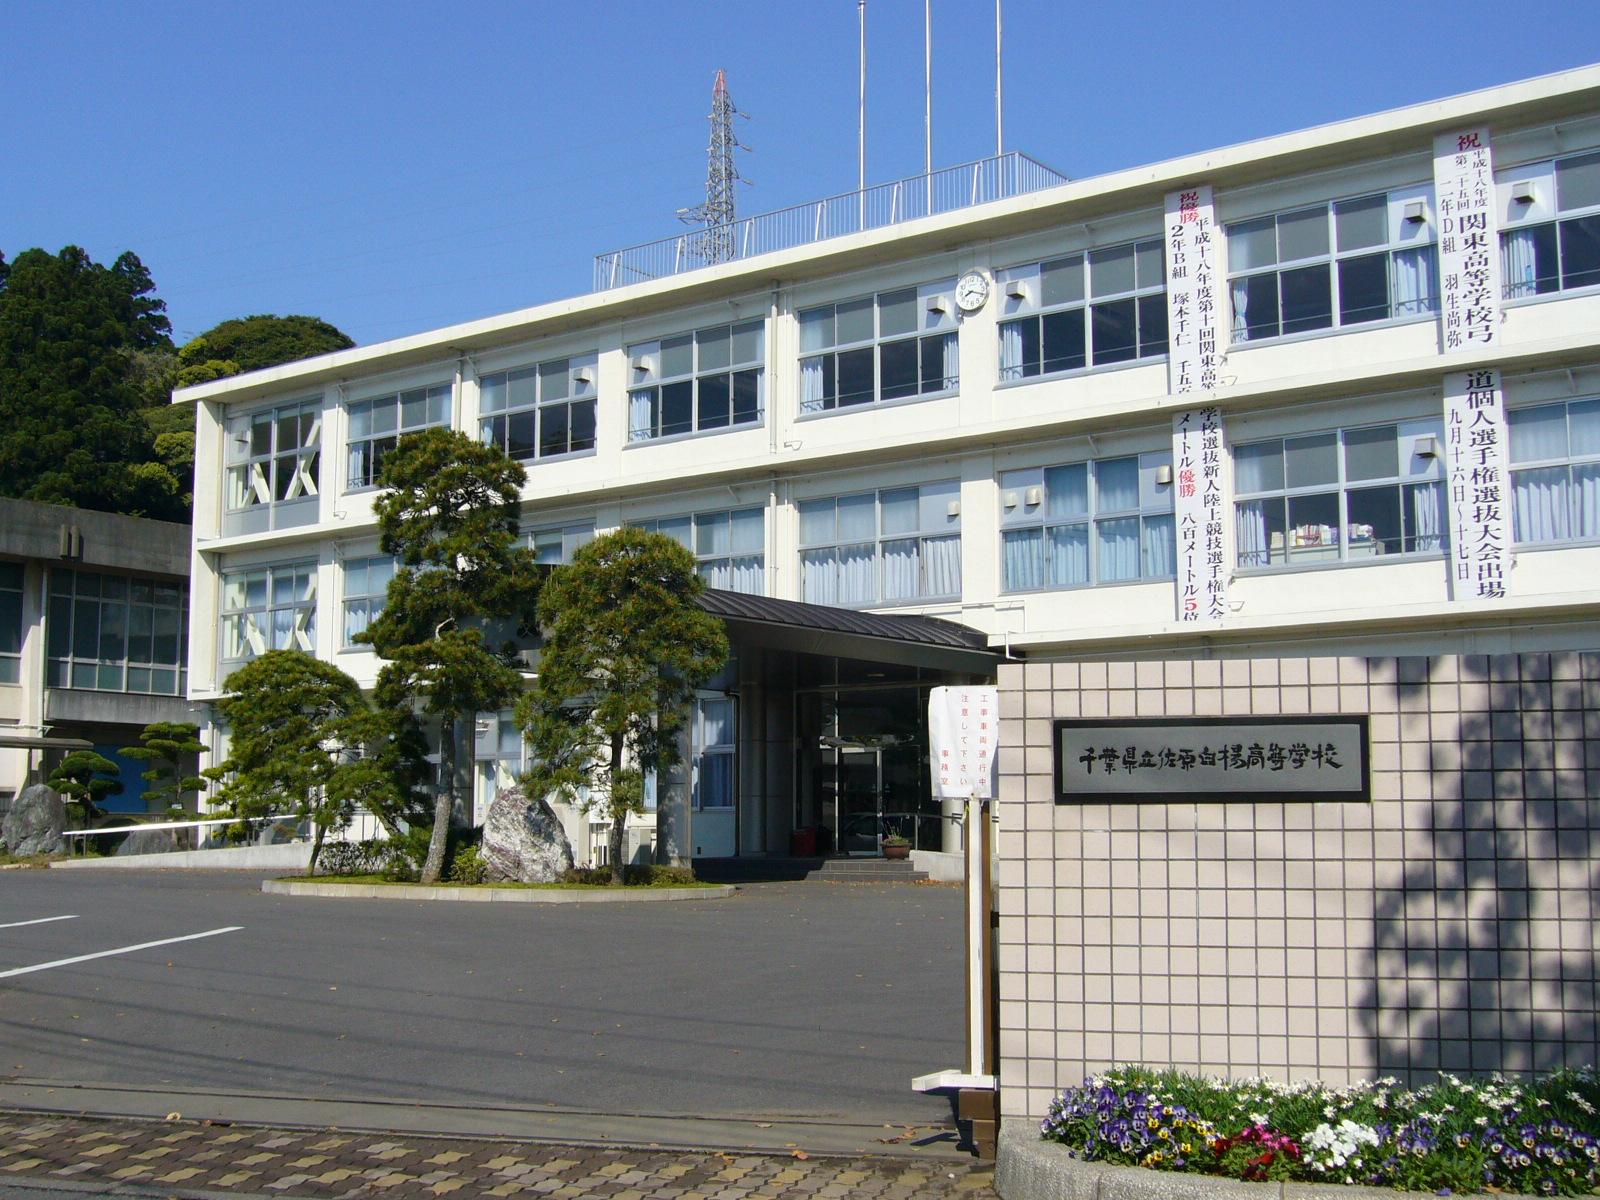 Architecture Floor Plan Software Free File Sawara Hakuyou High School Katori City Japan Jpg